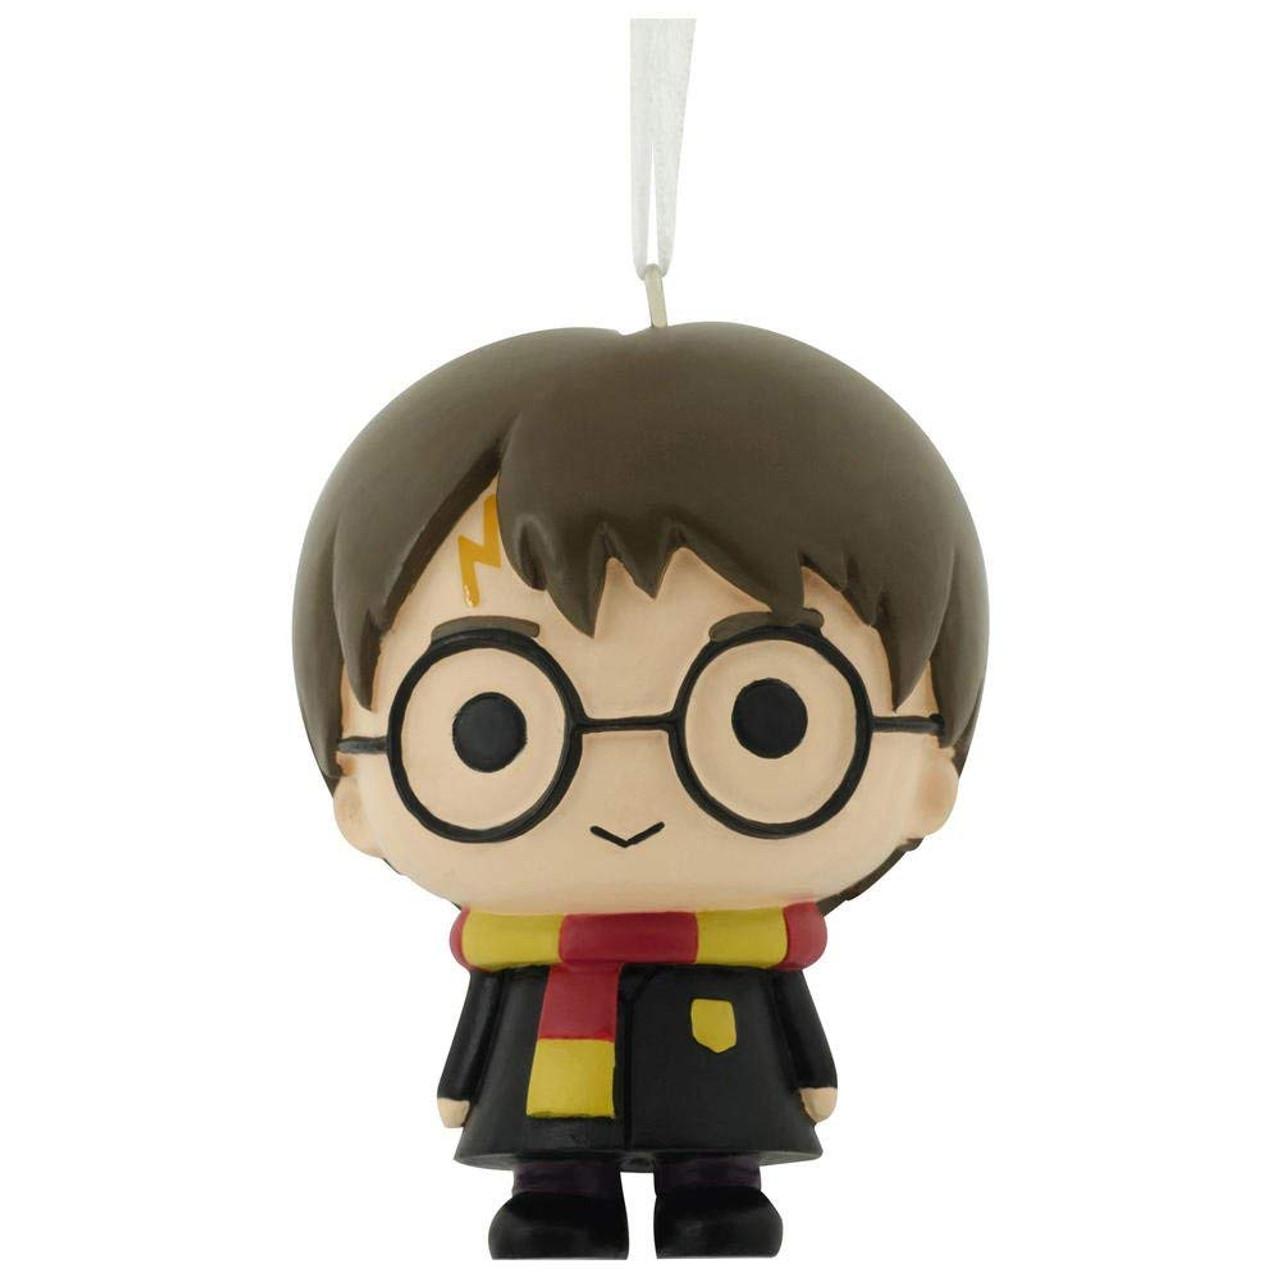 Hallmark Harry Potter Holiday Christmas Tree Ornament